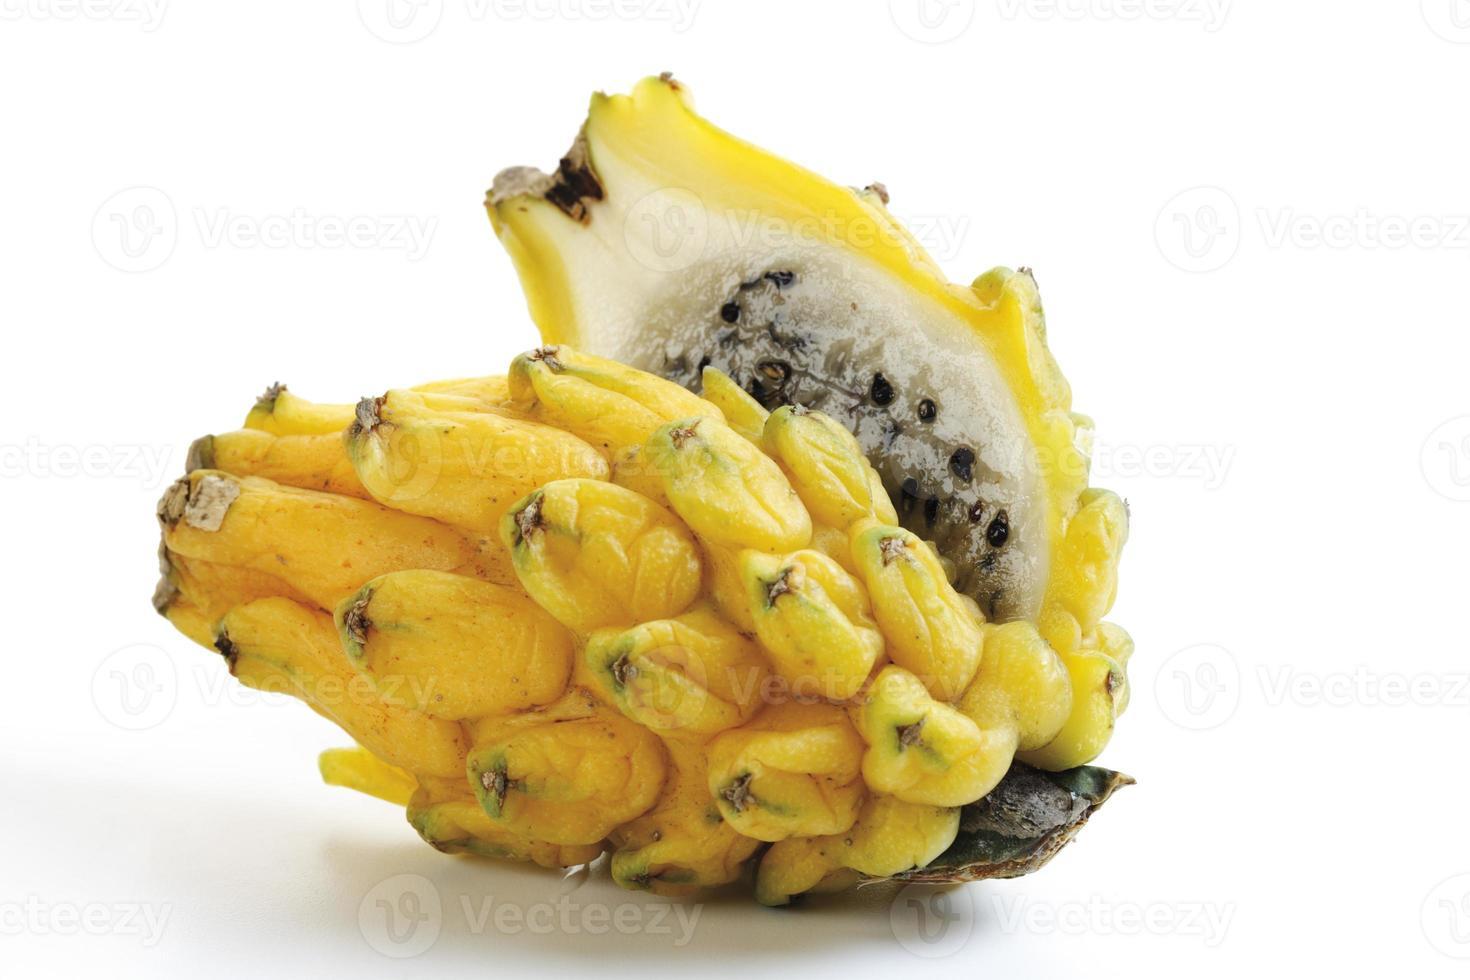 Yellow pitahaya, close-up photo